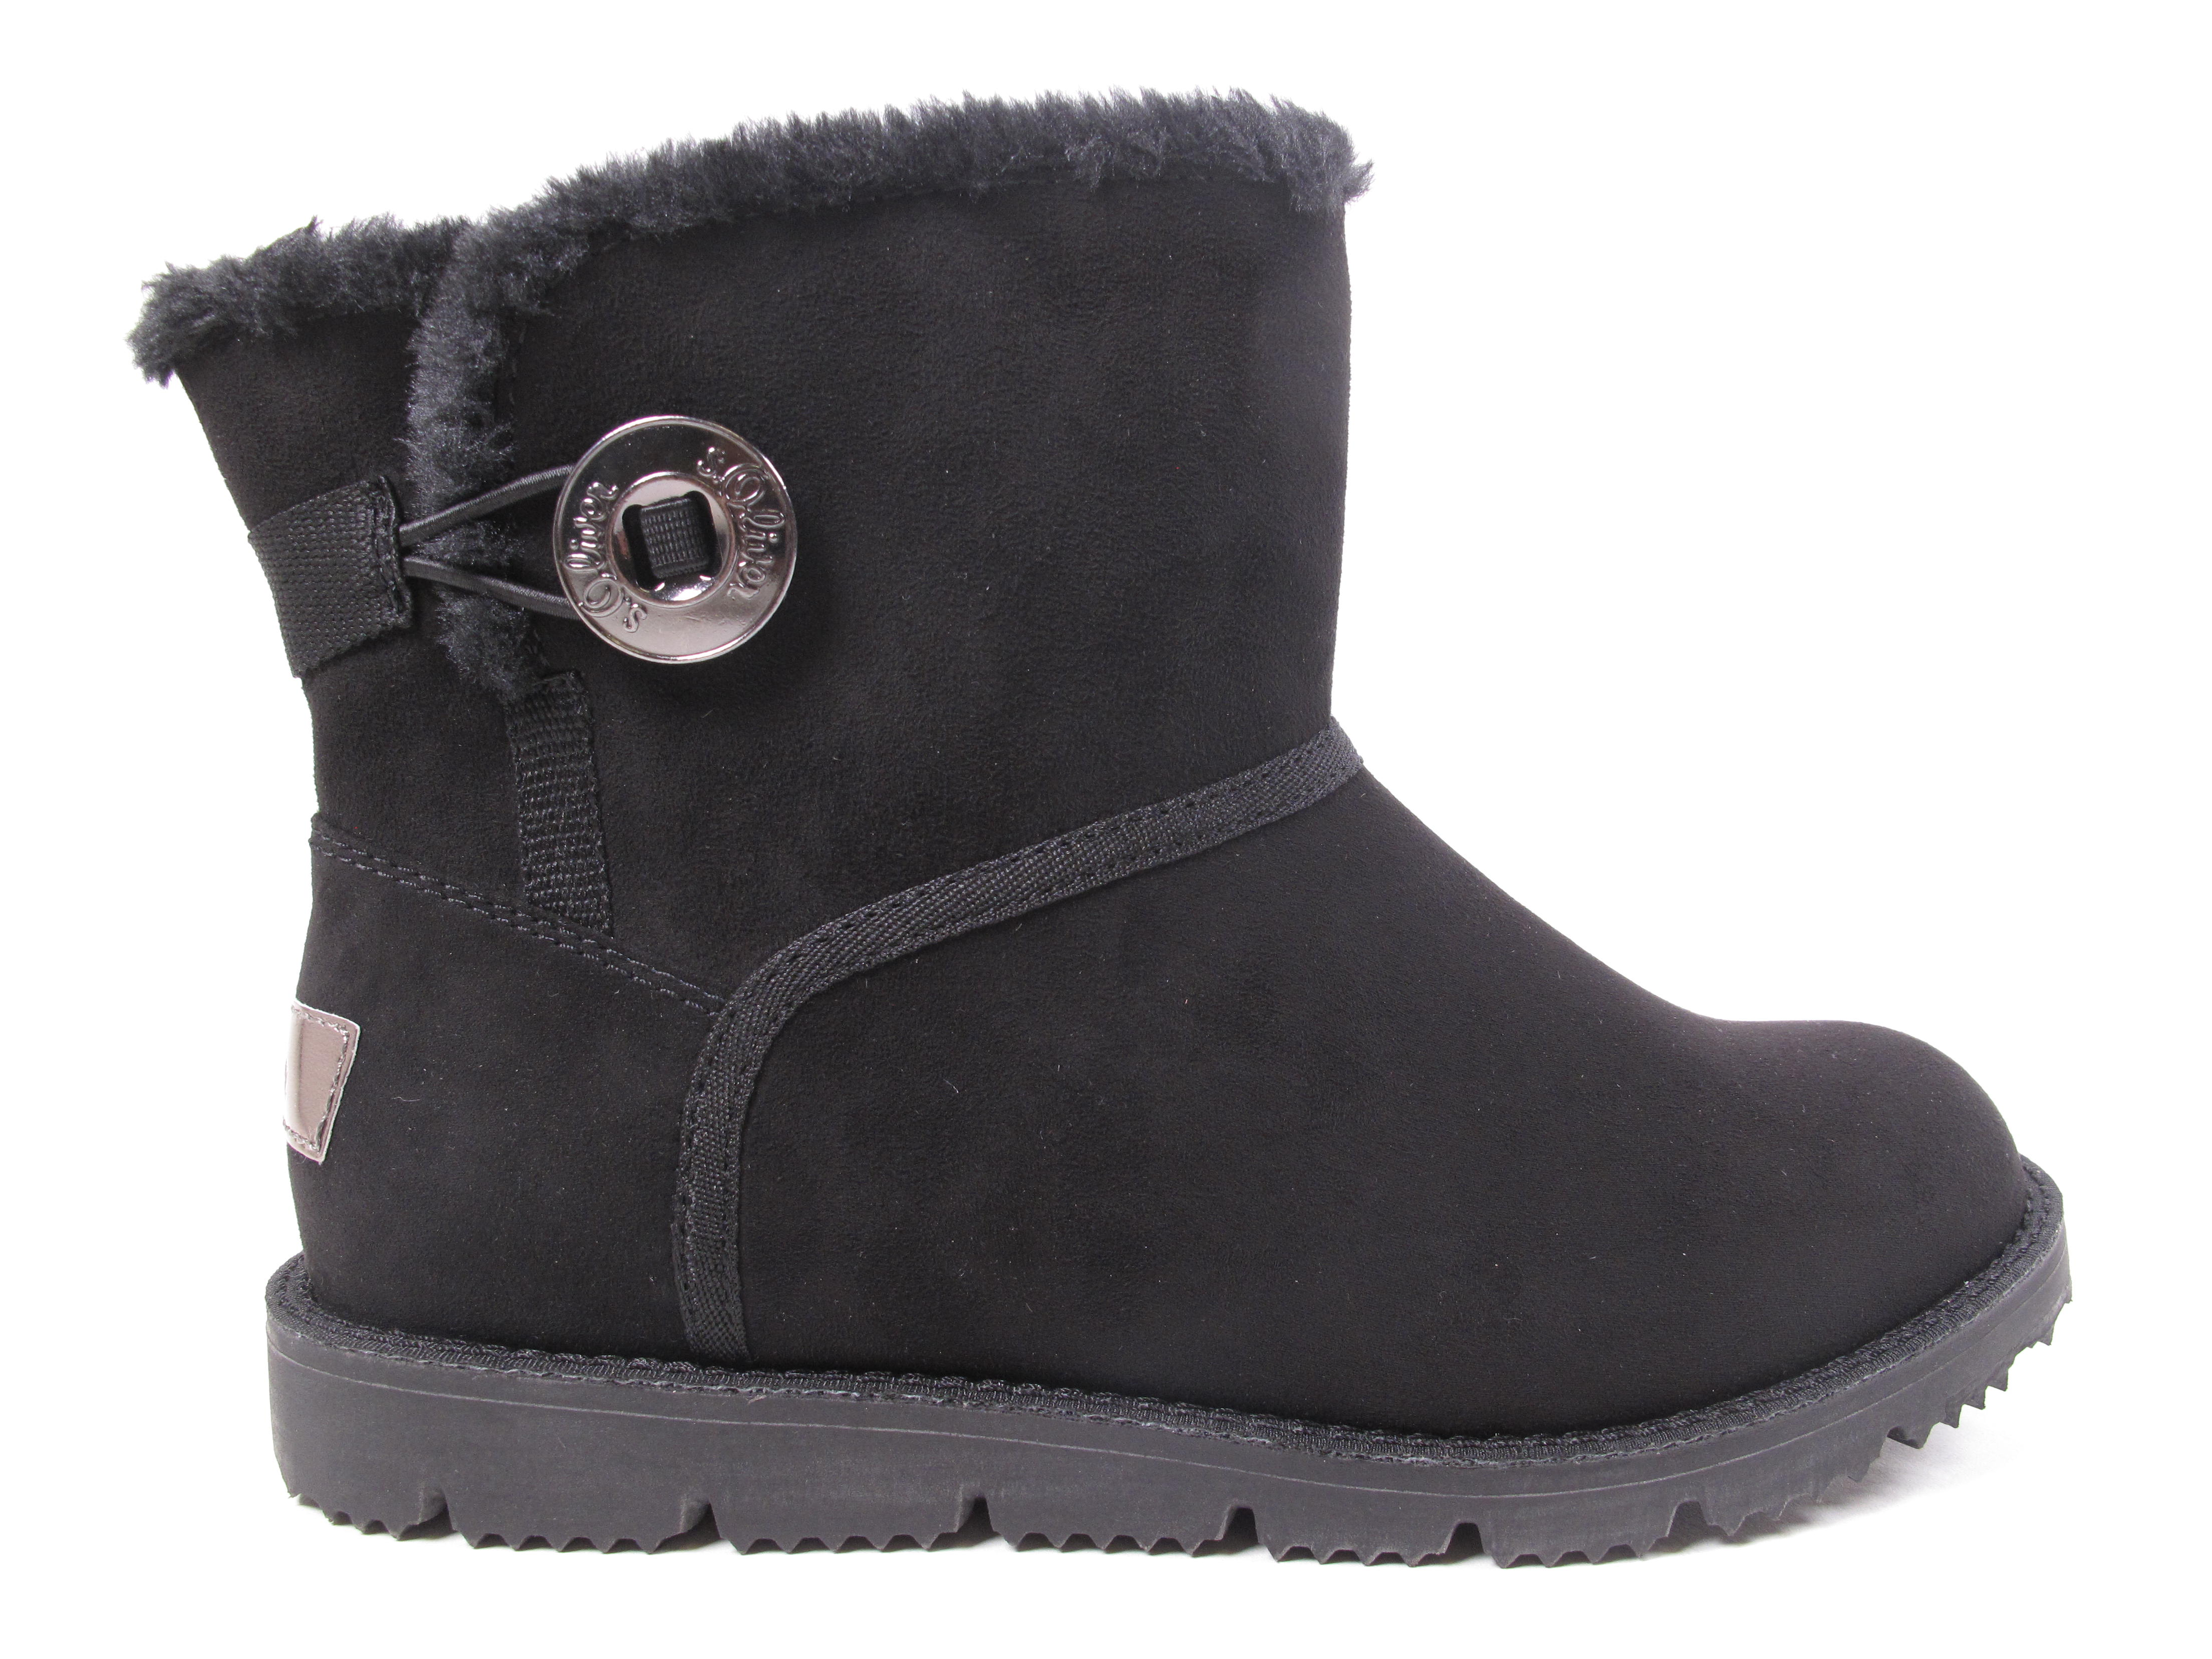 S.OLIVER women Bottines Bottes shoes D'Hiver 26412-21 001 black Neuf